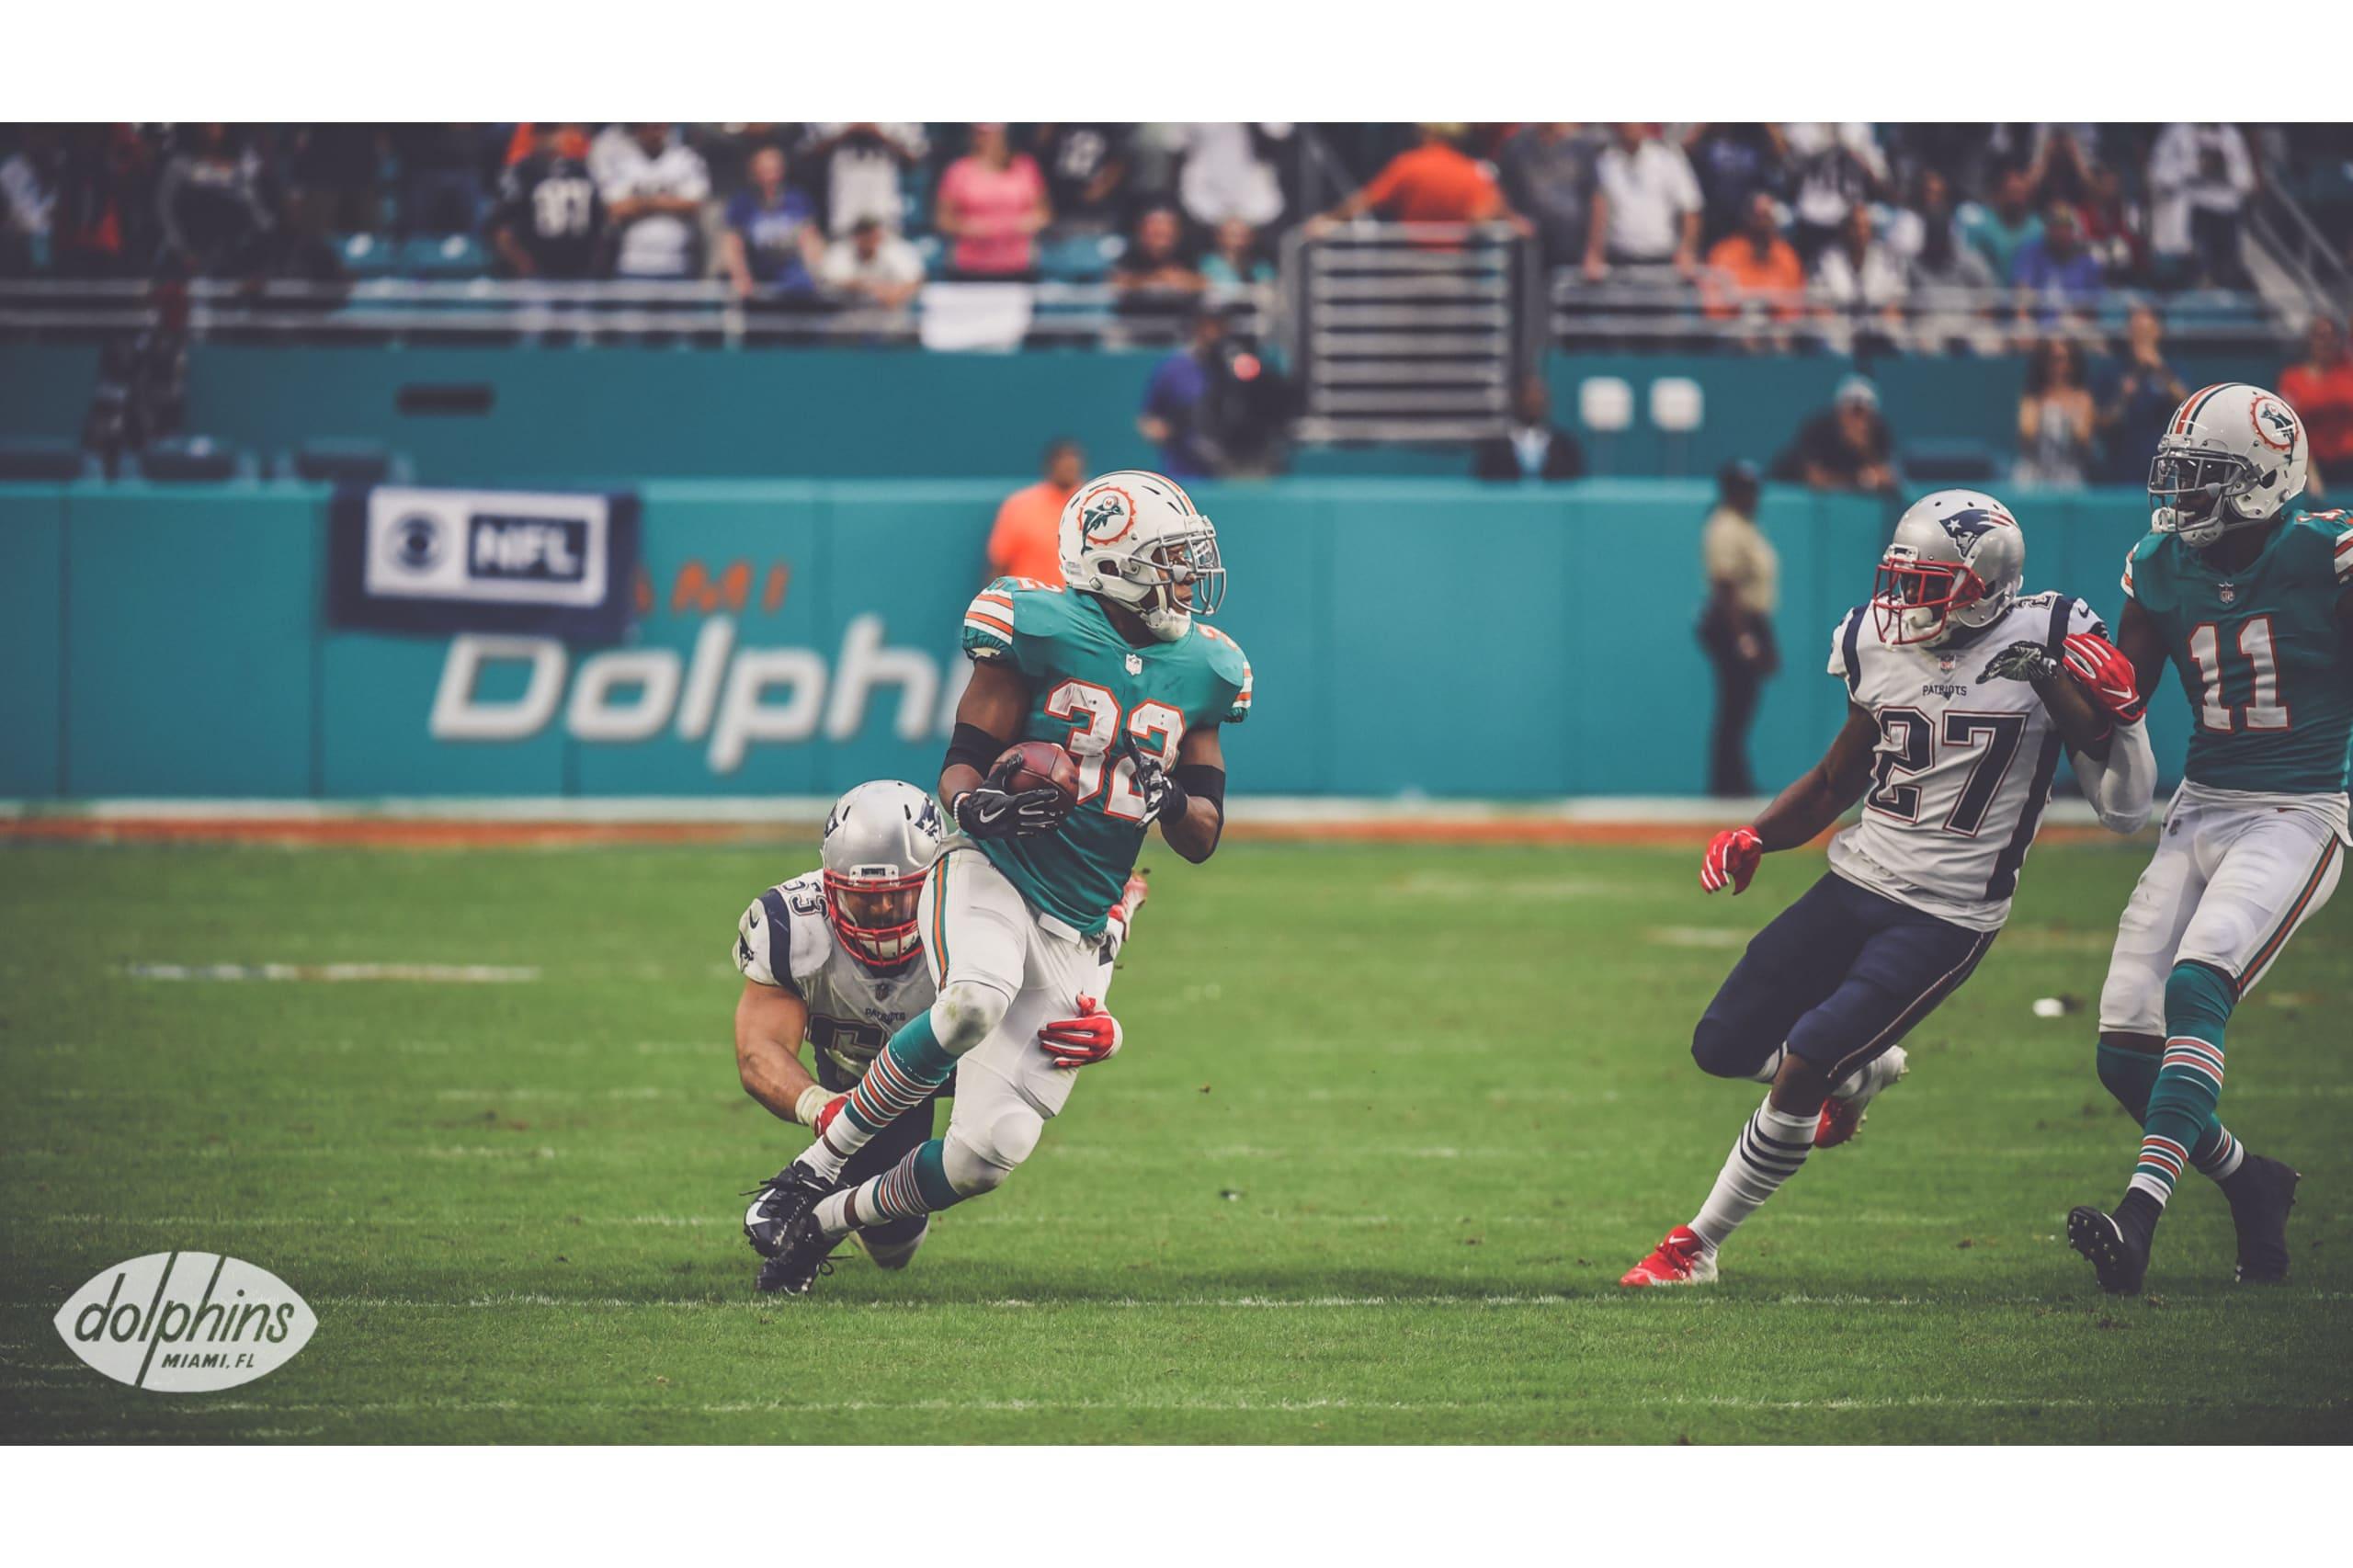 9458eba6d Watch: Dolphins' Kenyan Drake scores miracle TD to upset Patriots ...